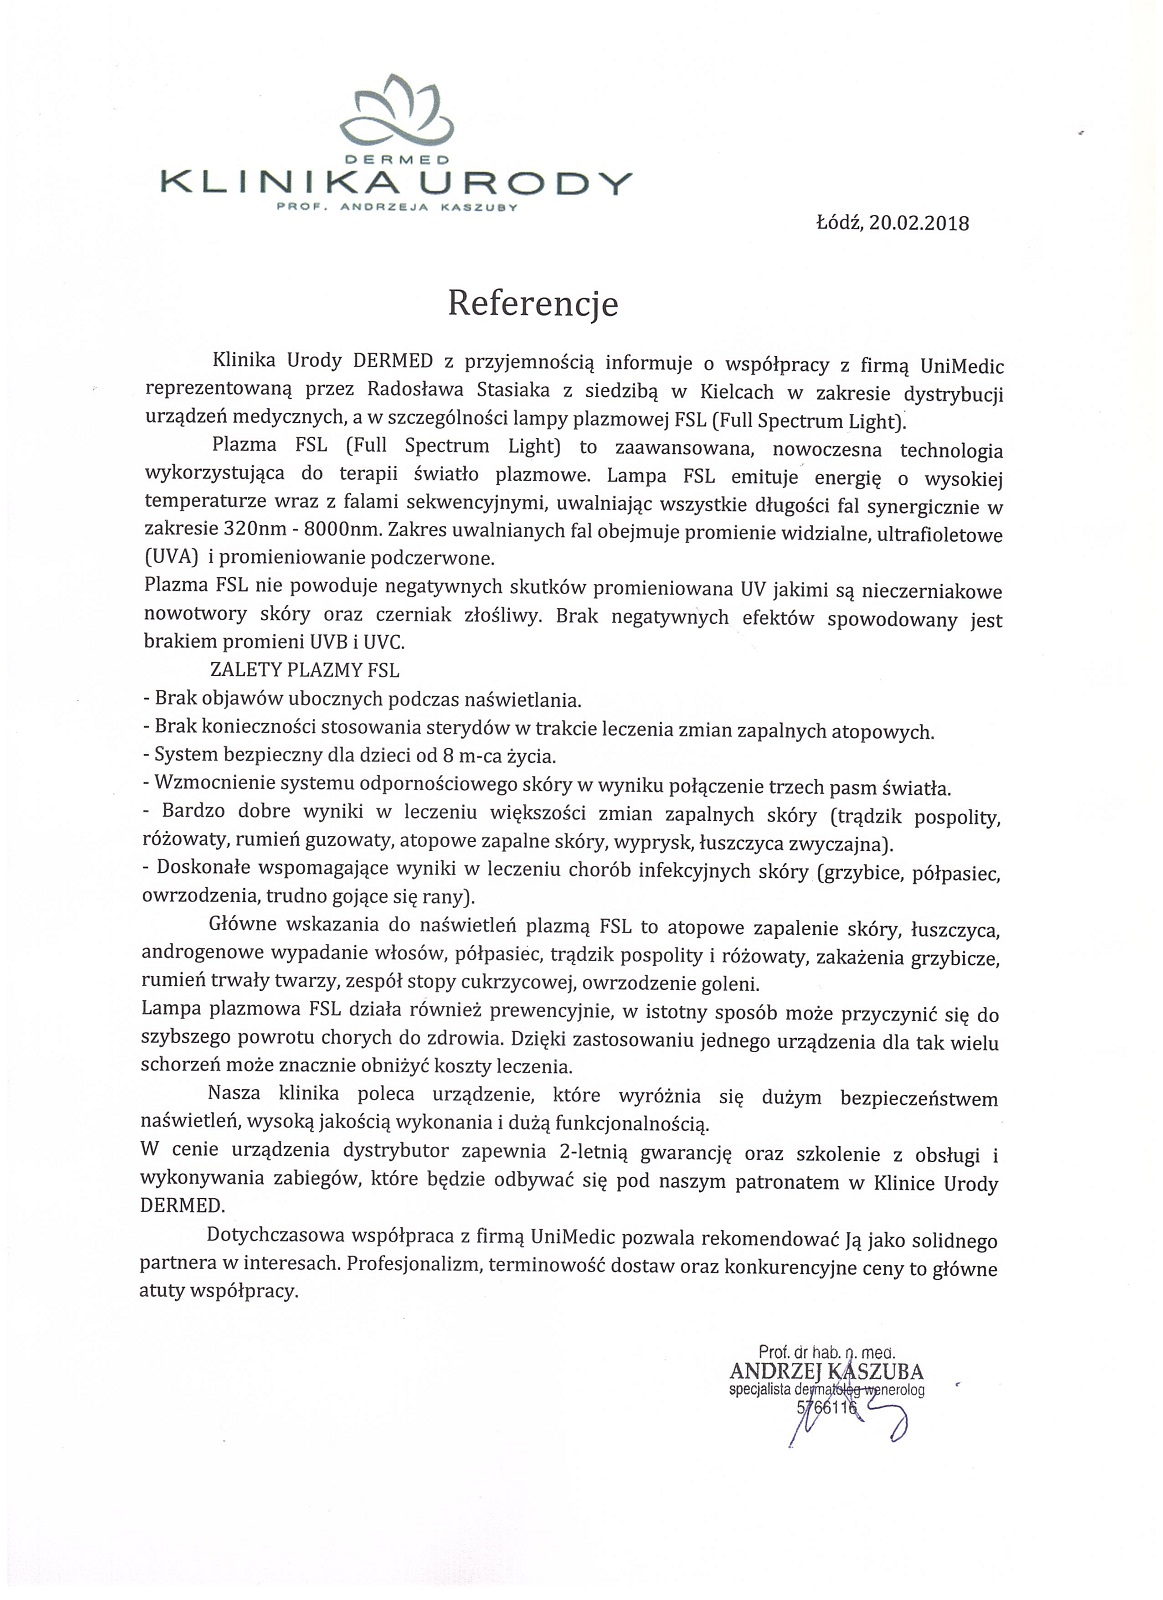 Unimedic_rekomendacja_FSL